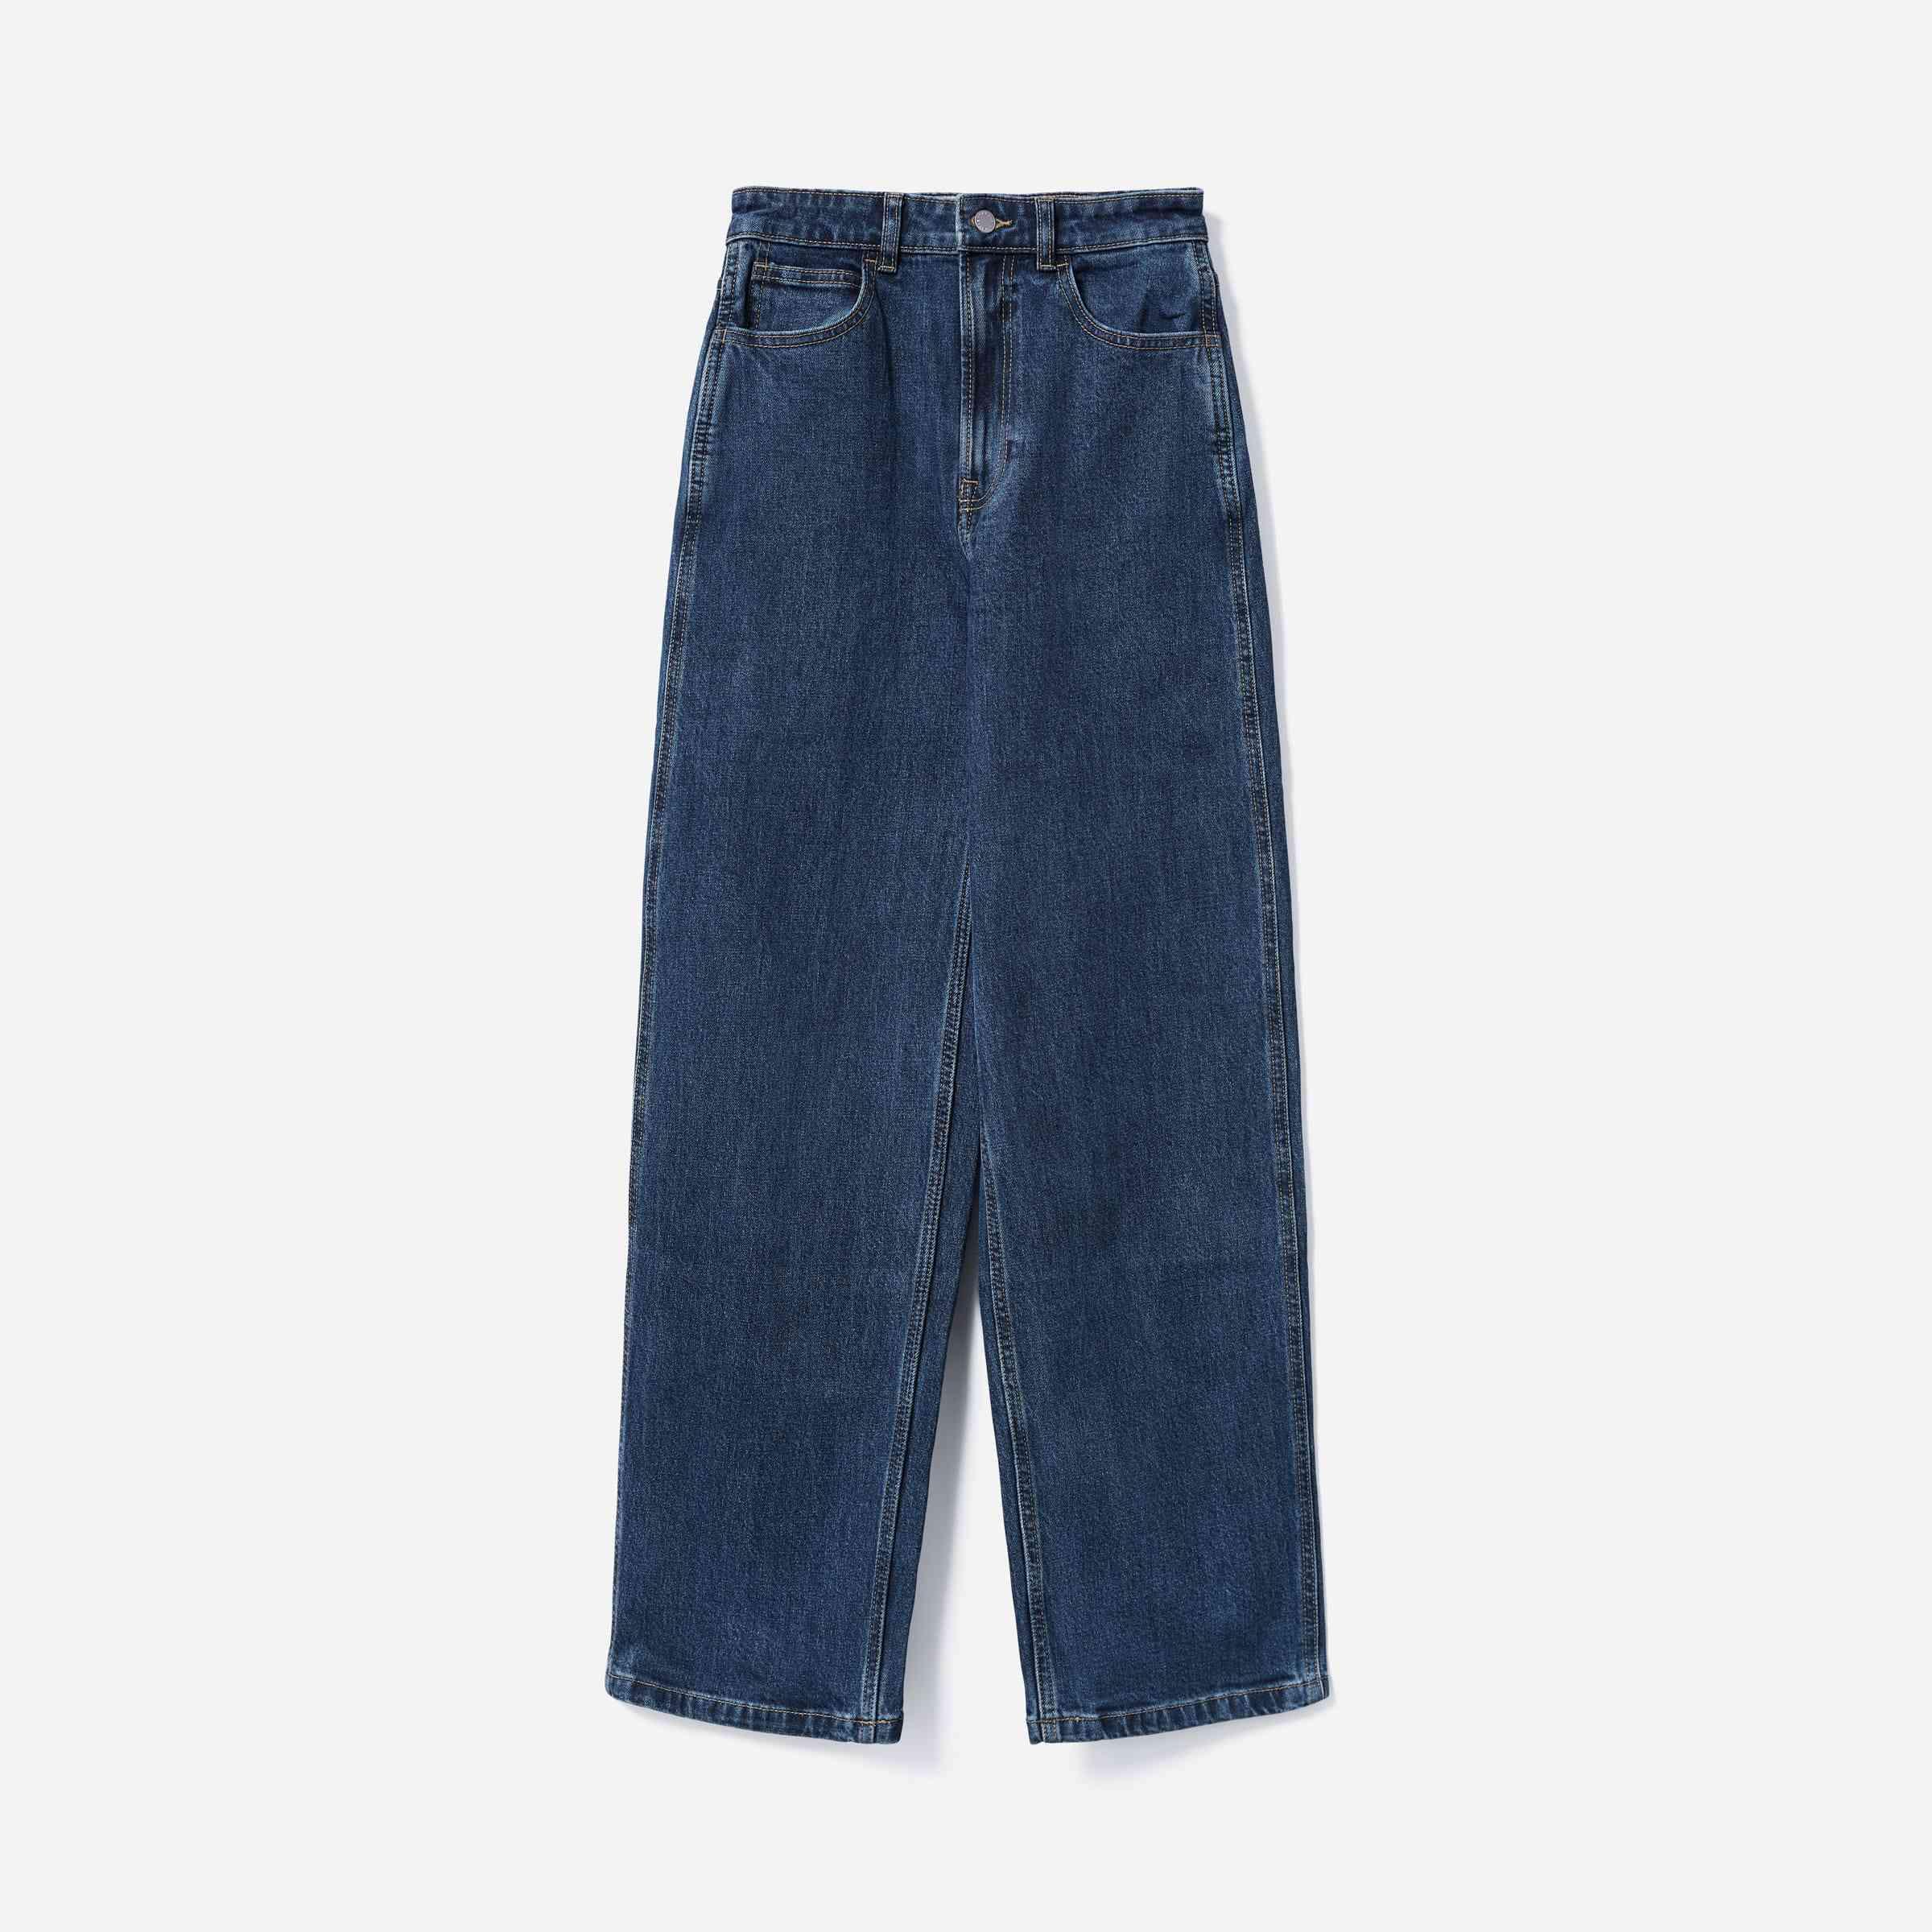 Everlane The Way-High Baggy Jean